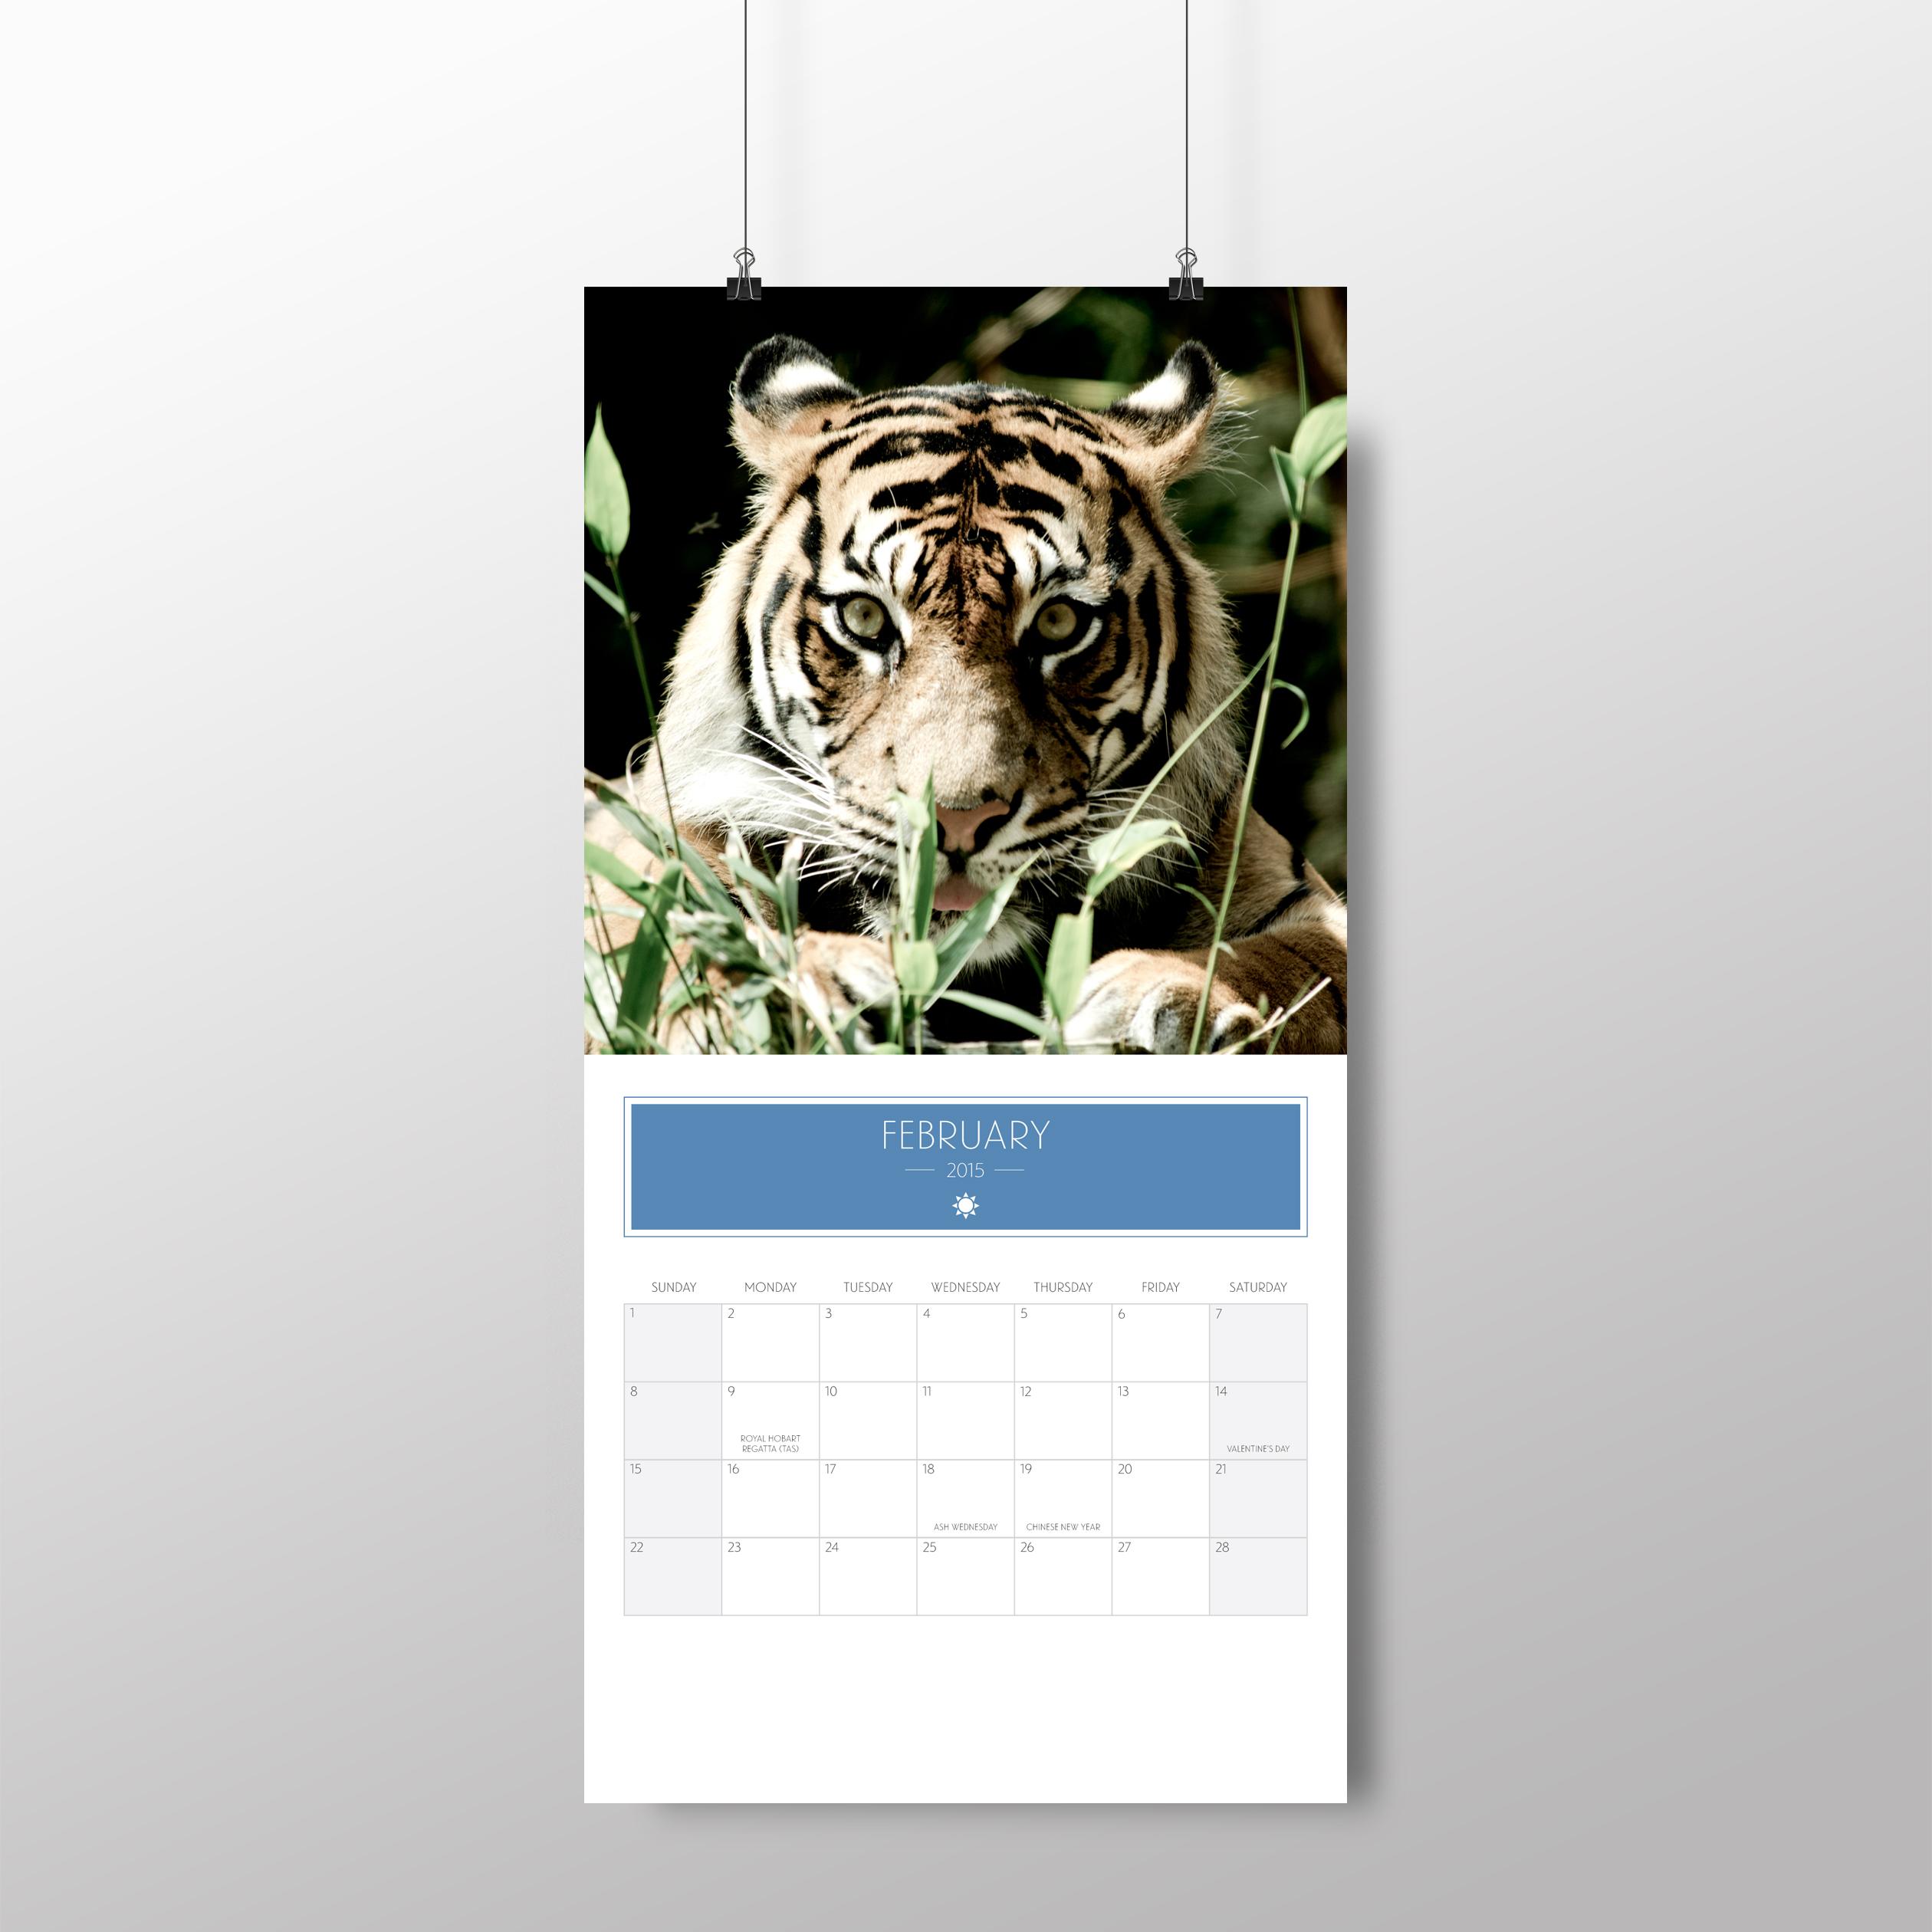 Animal calendar – February